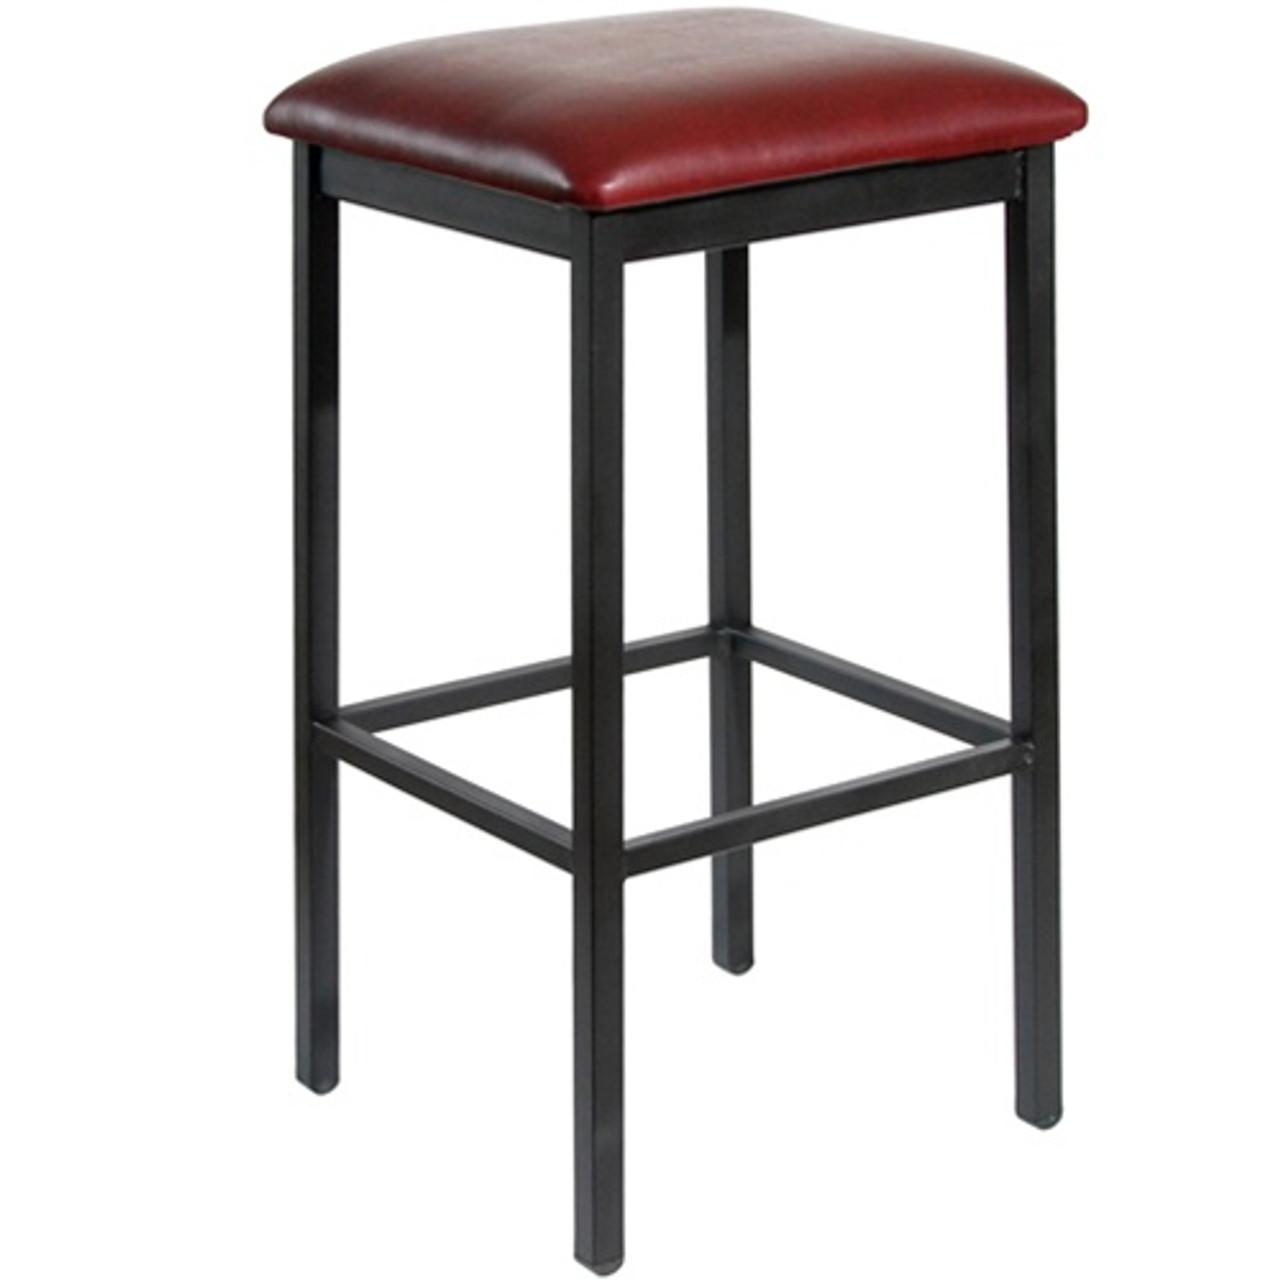 Swell Bfm Seating Trent Black Metal Backless Bar Stool With Vinyl Seat 2510B Sb Creativecarmelina Interior Chair Design Creativecarmelinacom